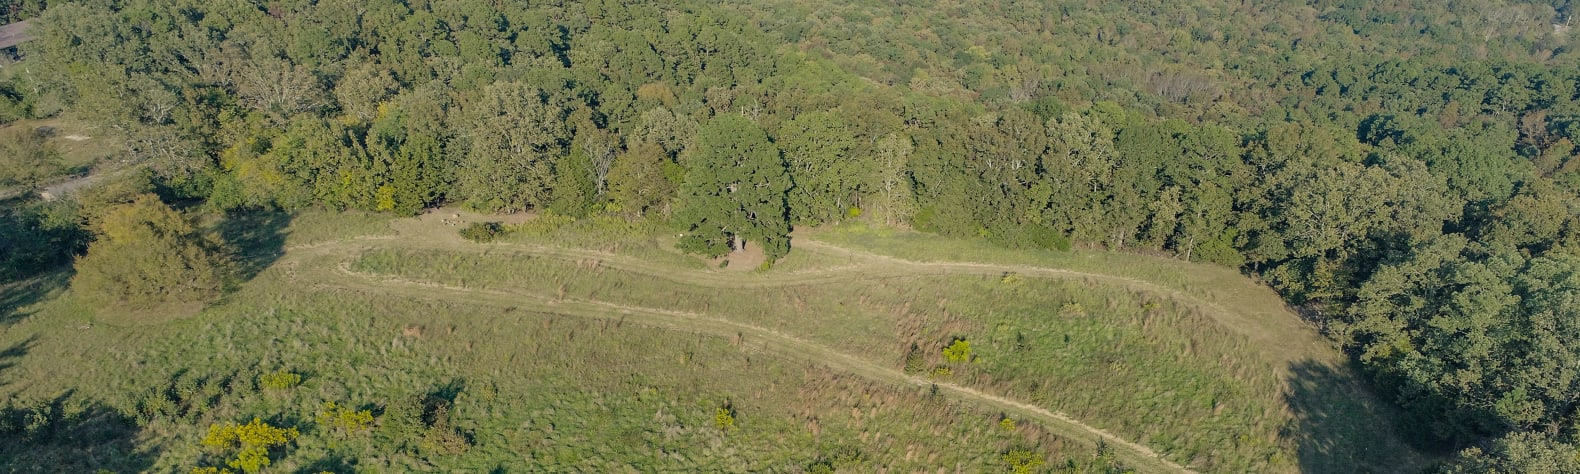 Prier Landing Campground